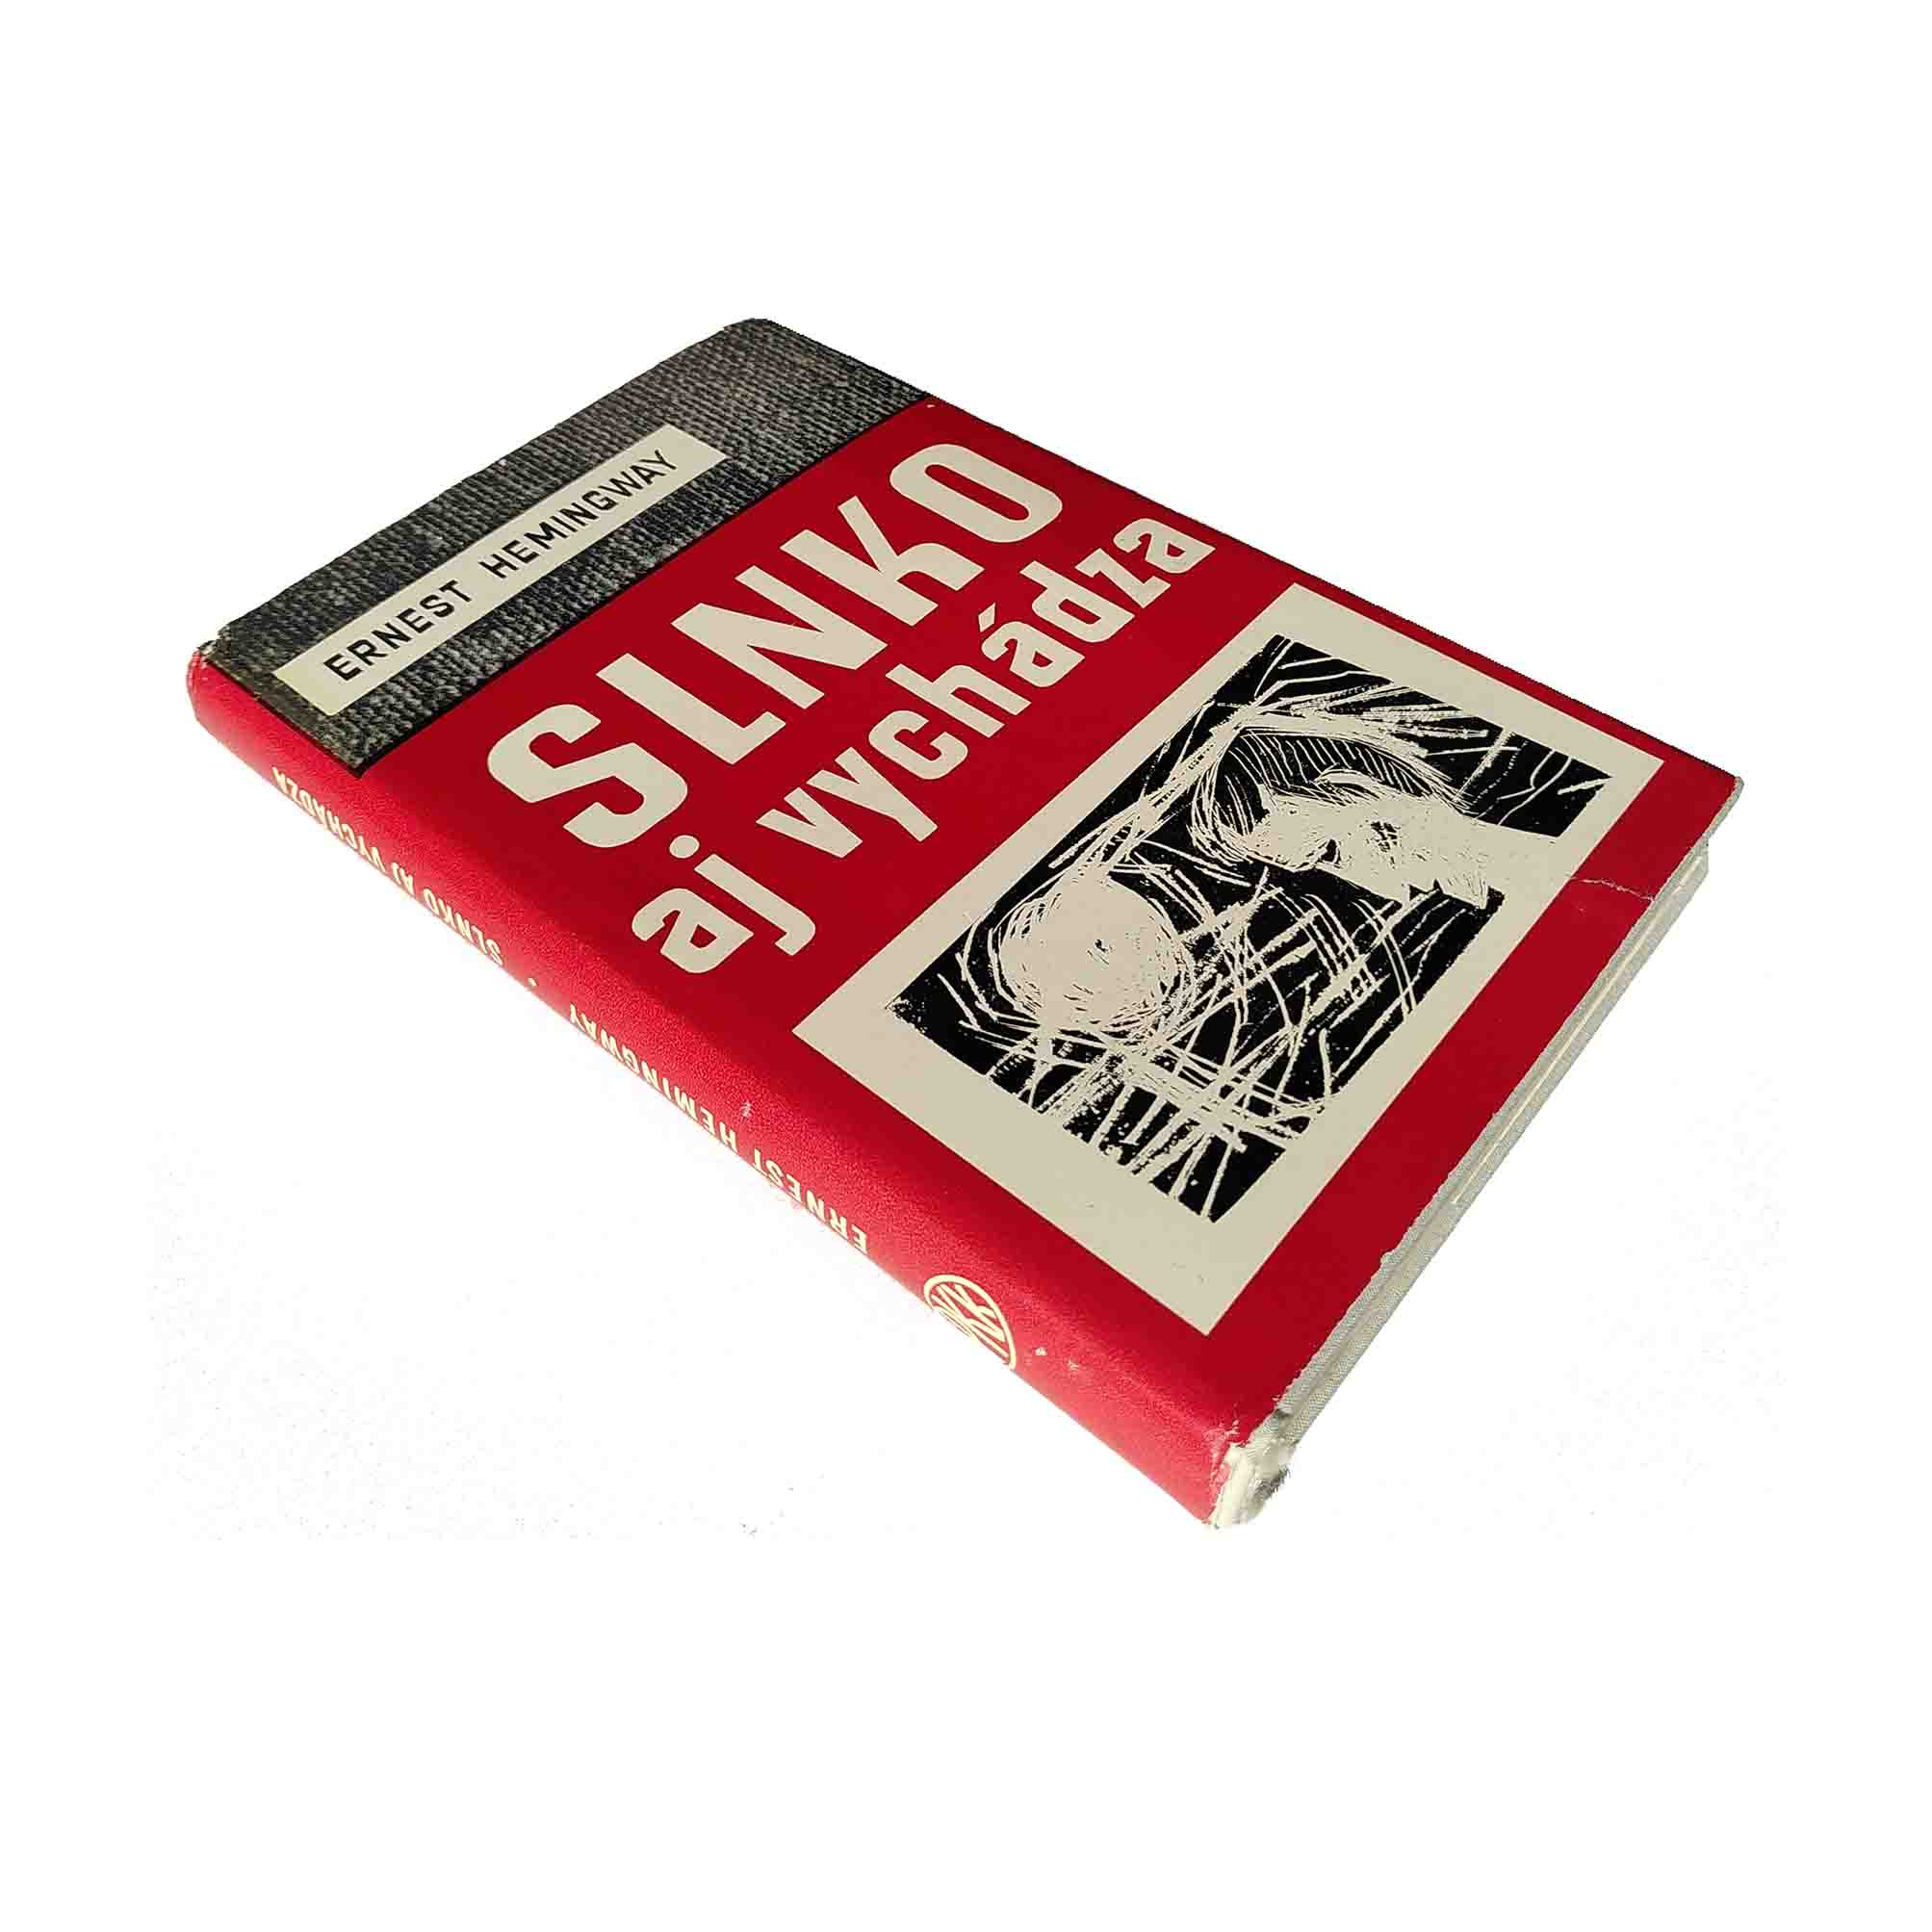 5913-Hemingway-Sun-Slovak-First-Edition-1968-Dust-Jacket-free-N.jpg